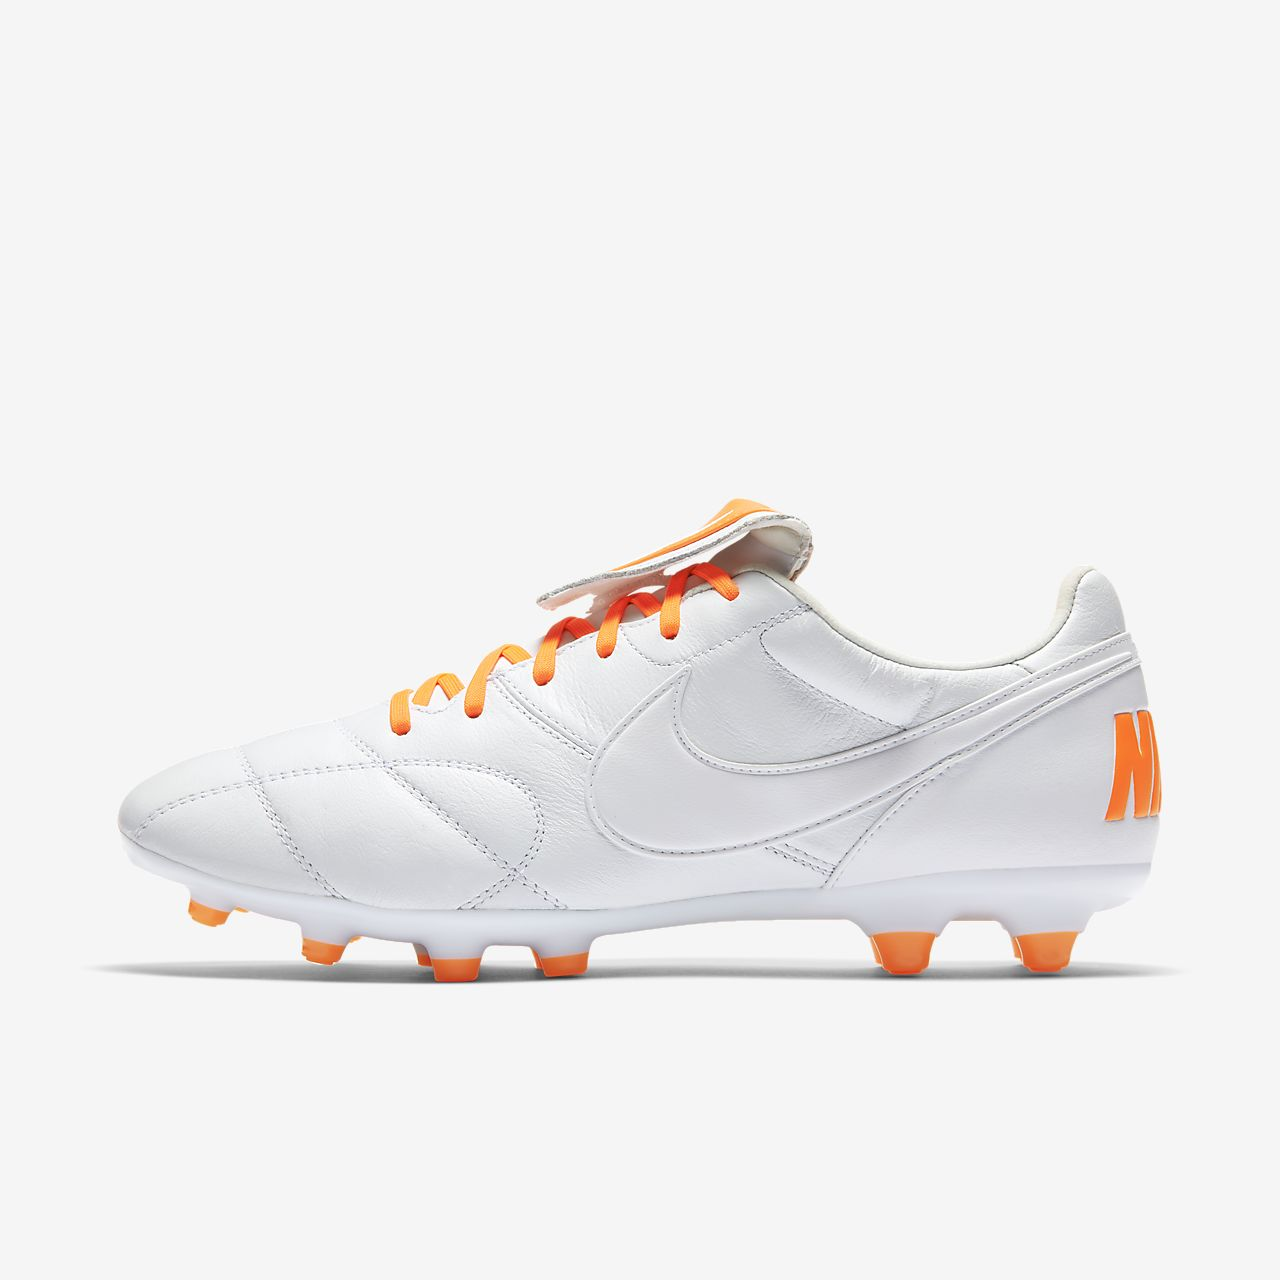 aeff992bdc8dbd Scarpa da calcio per terreni duri Nike Premier II FG. Nike.com IT